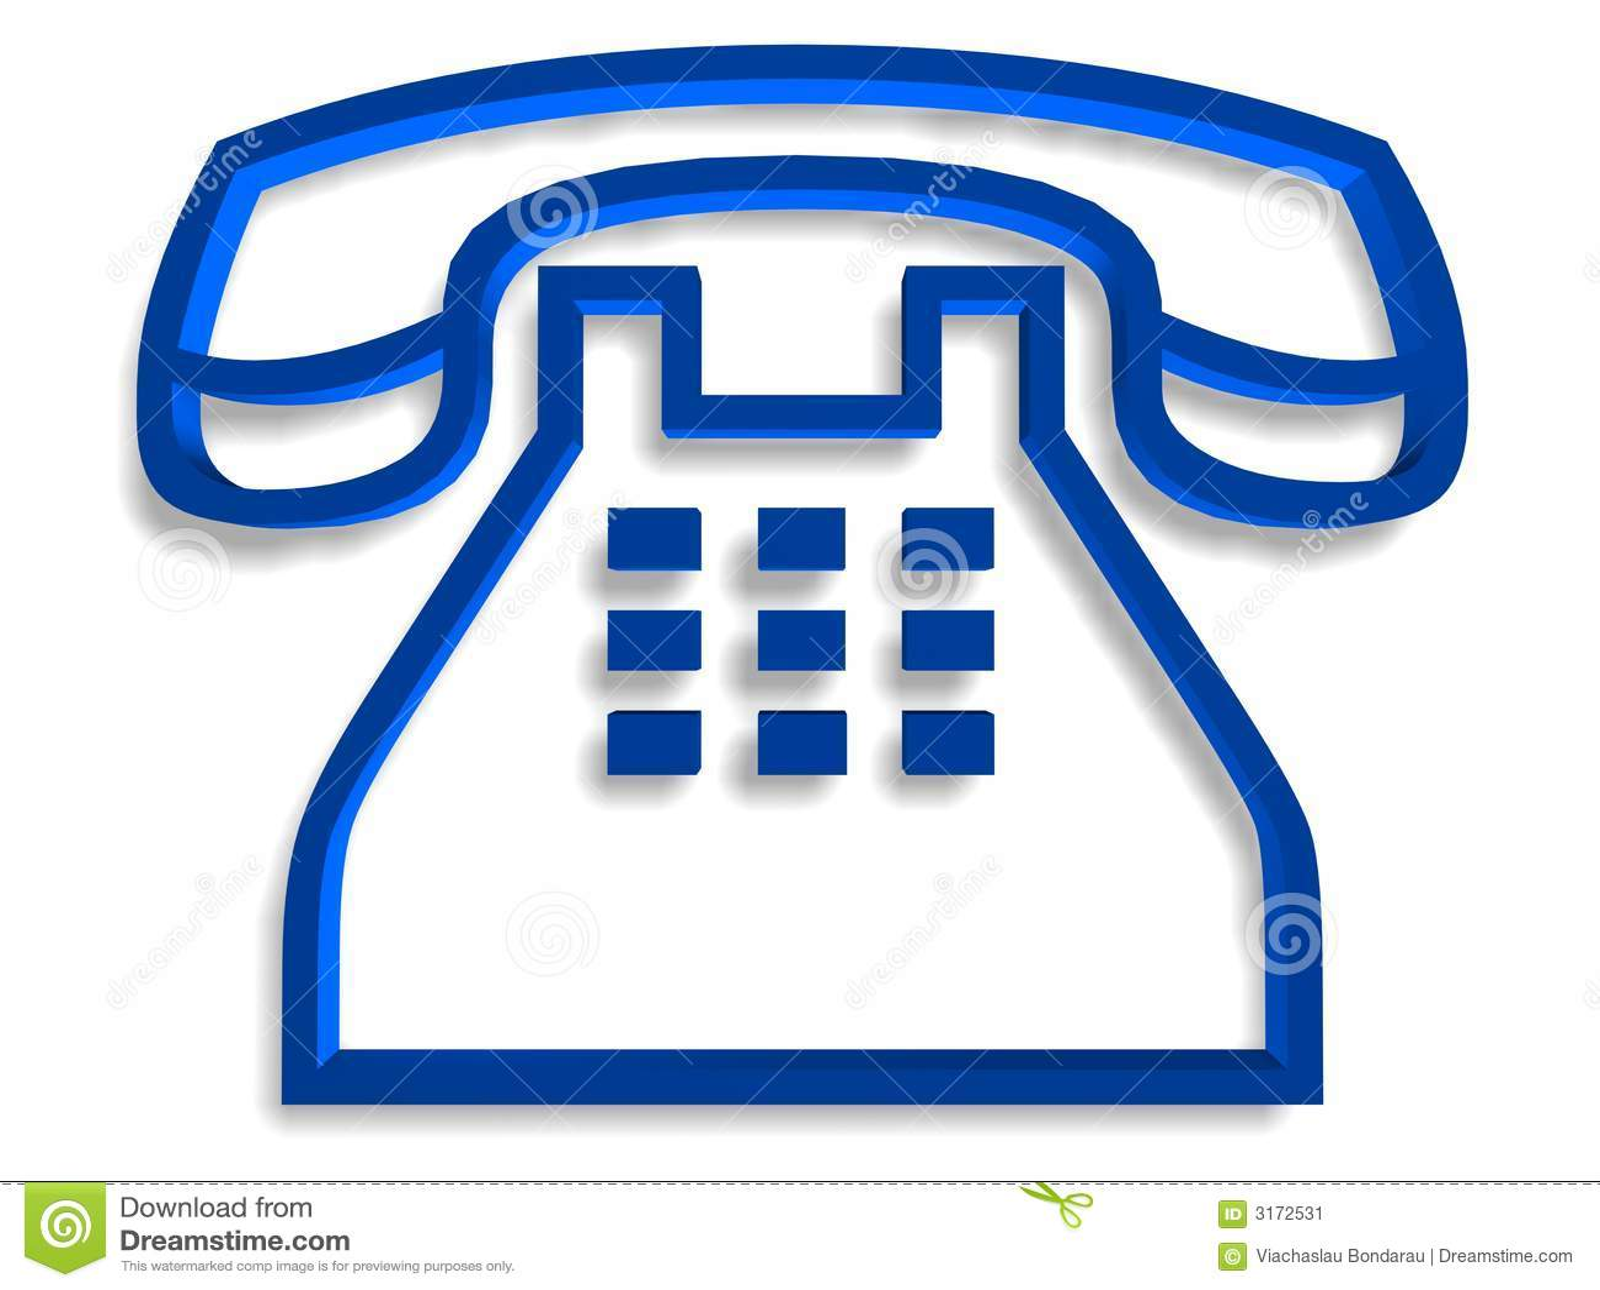 Contact Symbols Stock Illustration Illustration Of Icons 43766737